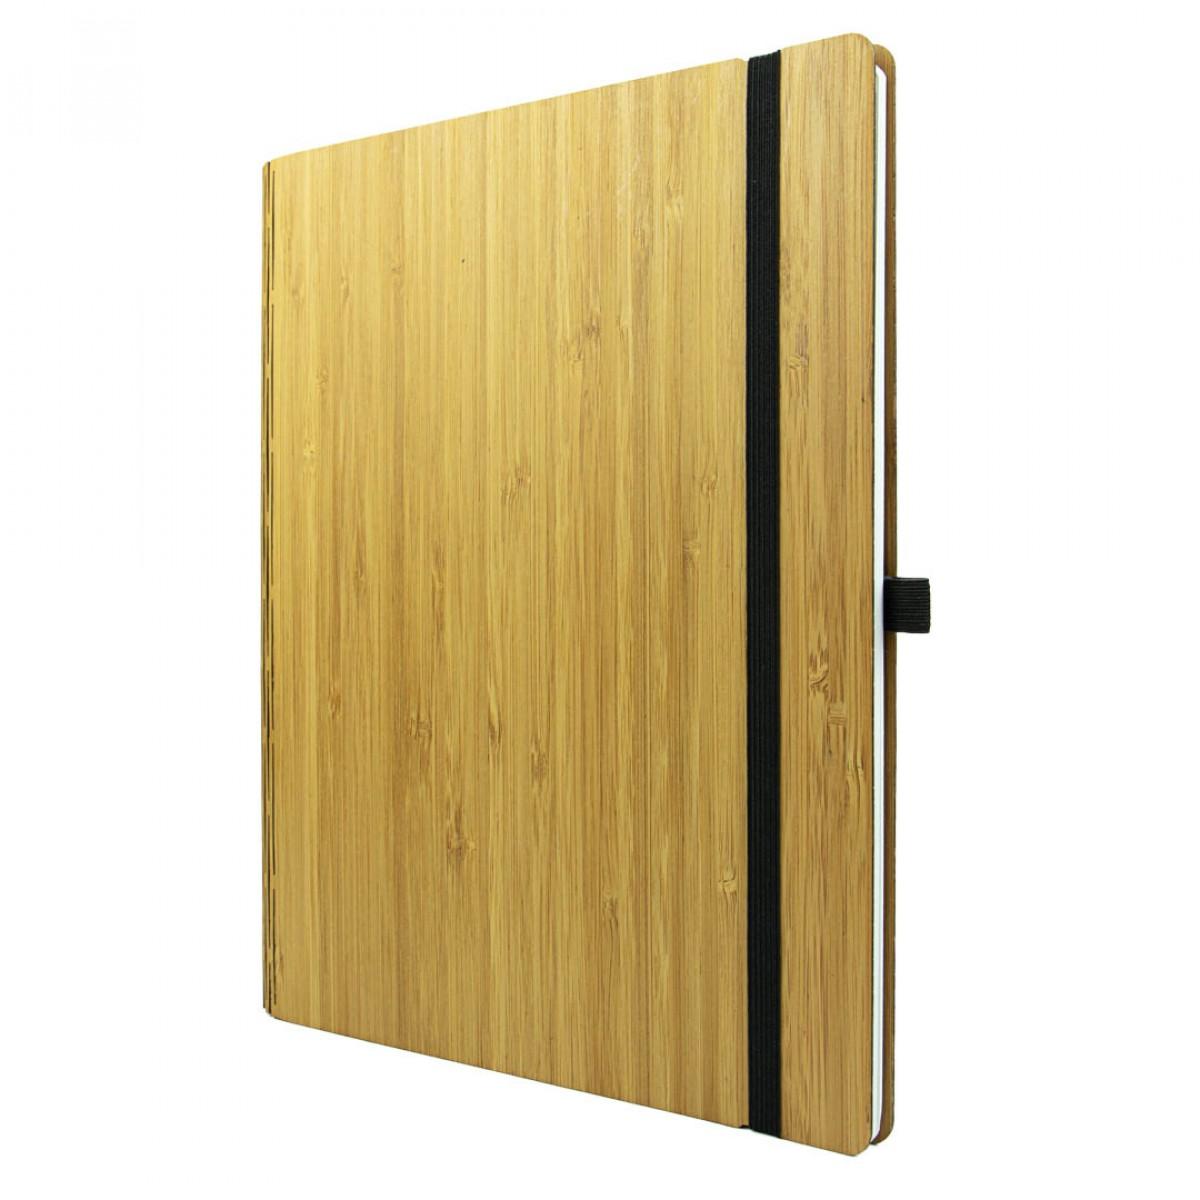 JUNGHOLZ Design NotizbuchWoodBook, Bambus A4